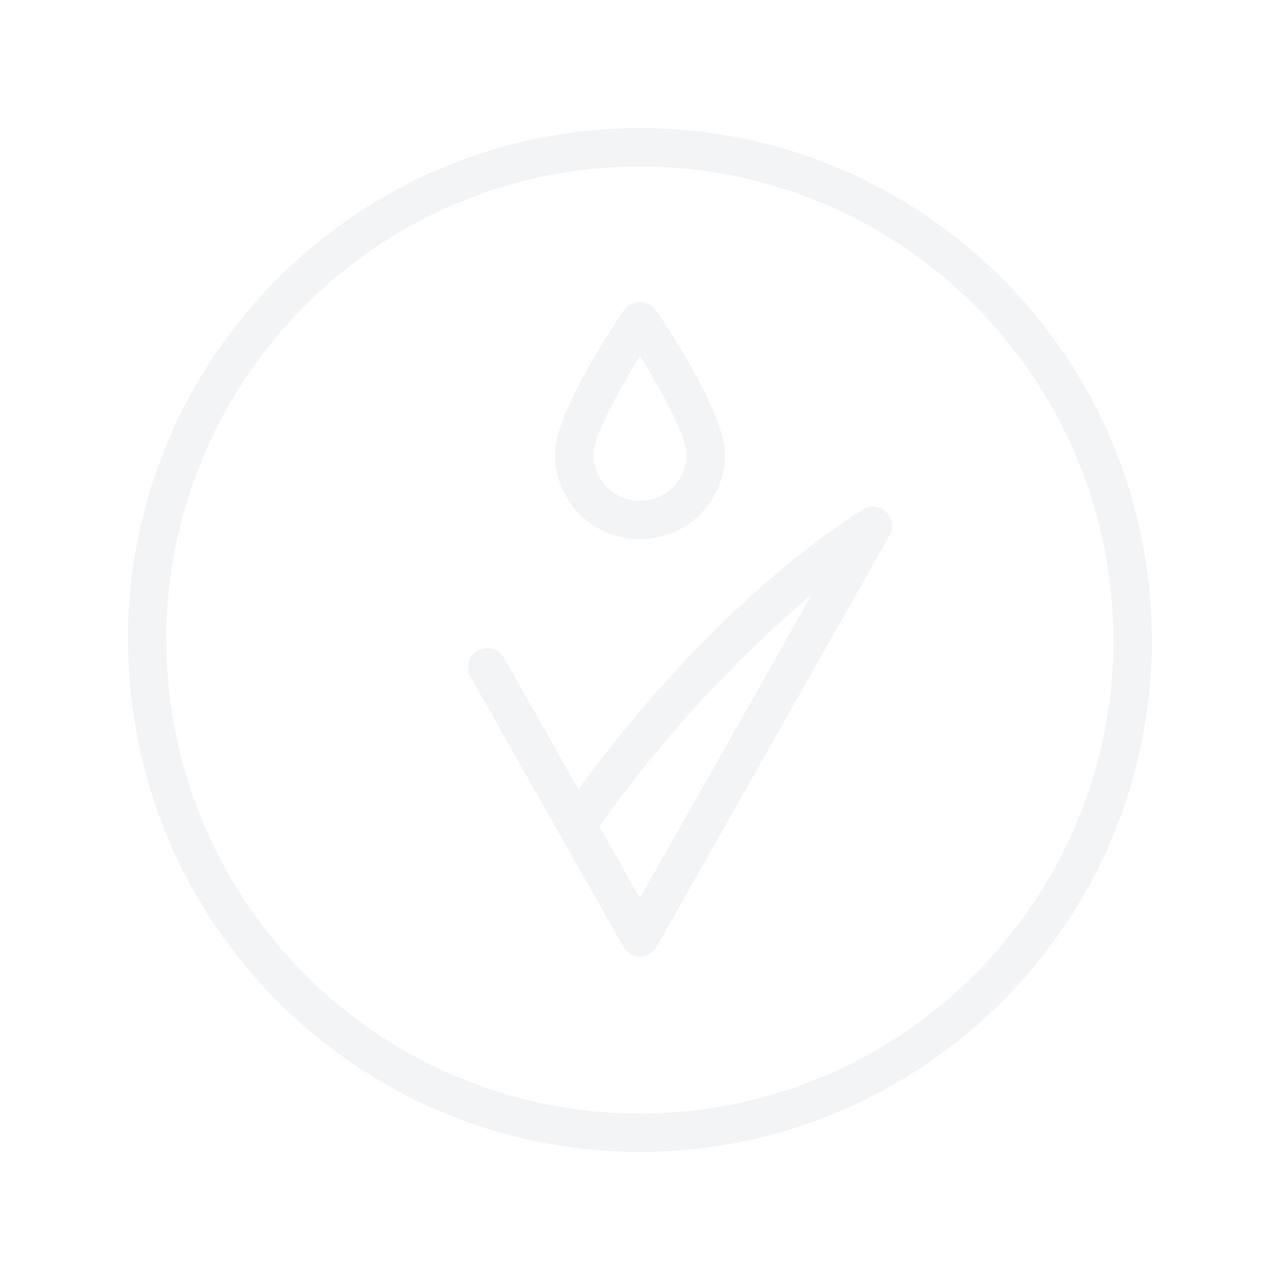 BIODROGA Puran 24h Care (Oily/Combination Skin) 40ml